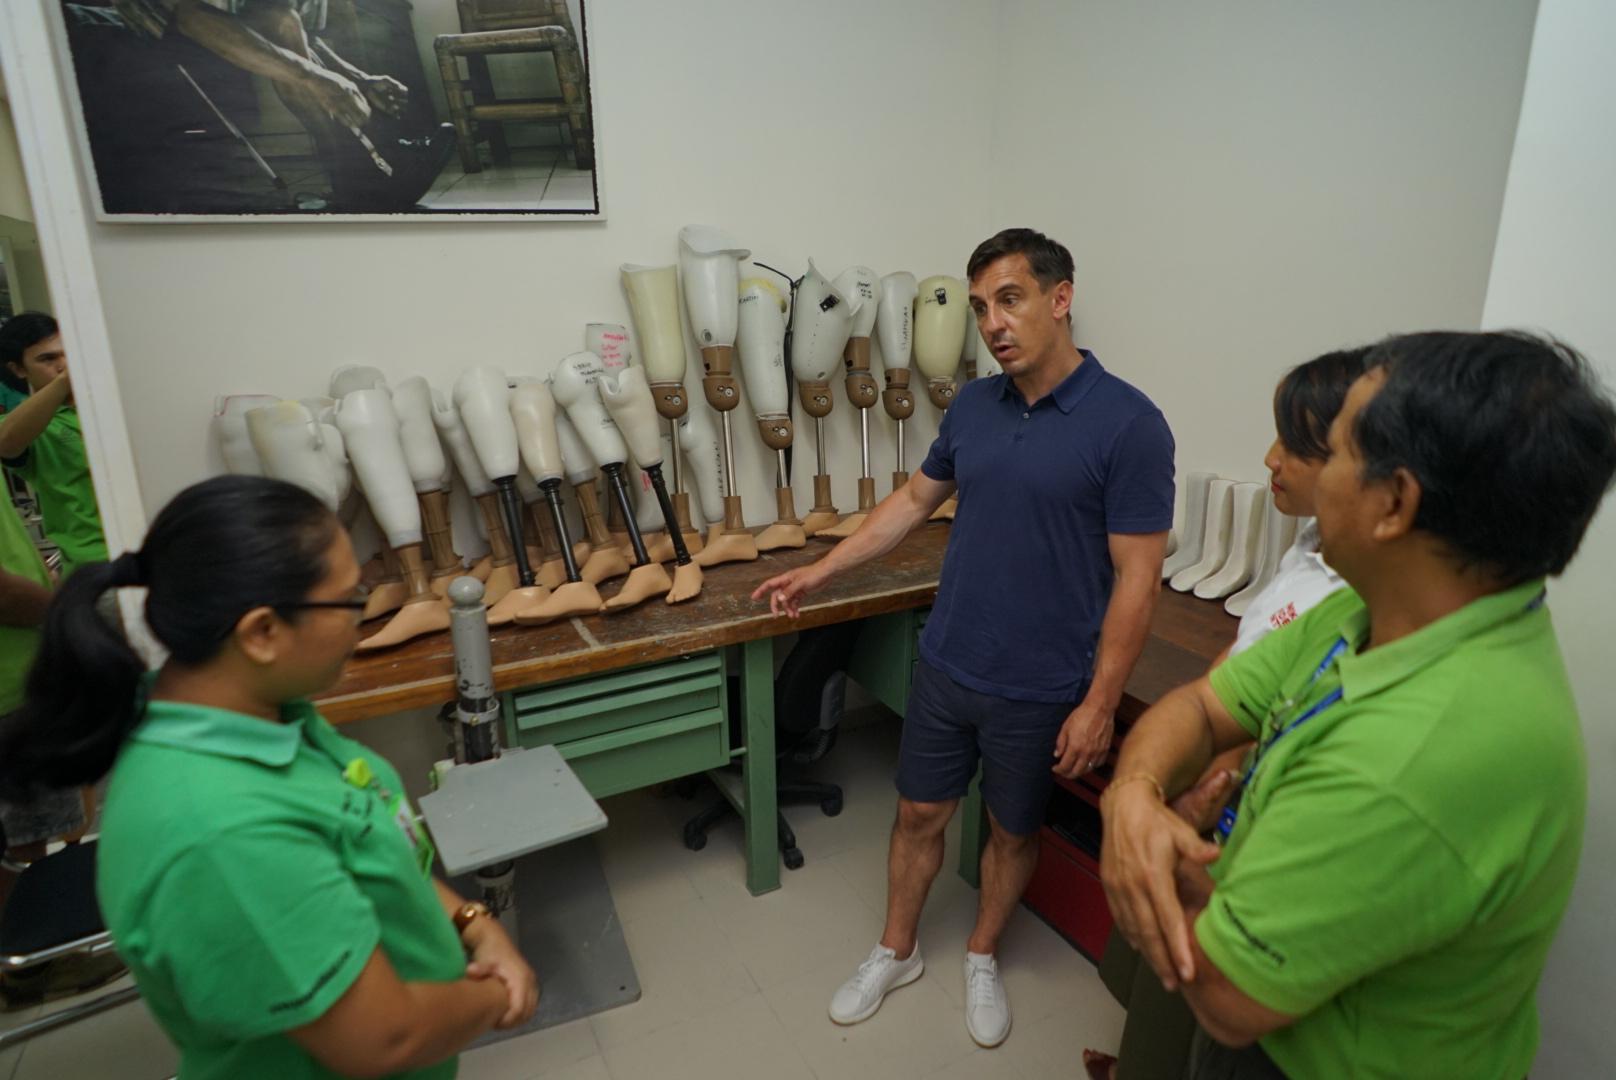 Gary Neville with PUSPADI staff at the PUSPADI prosthetic workshop